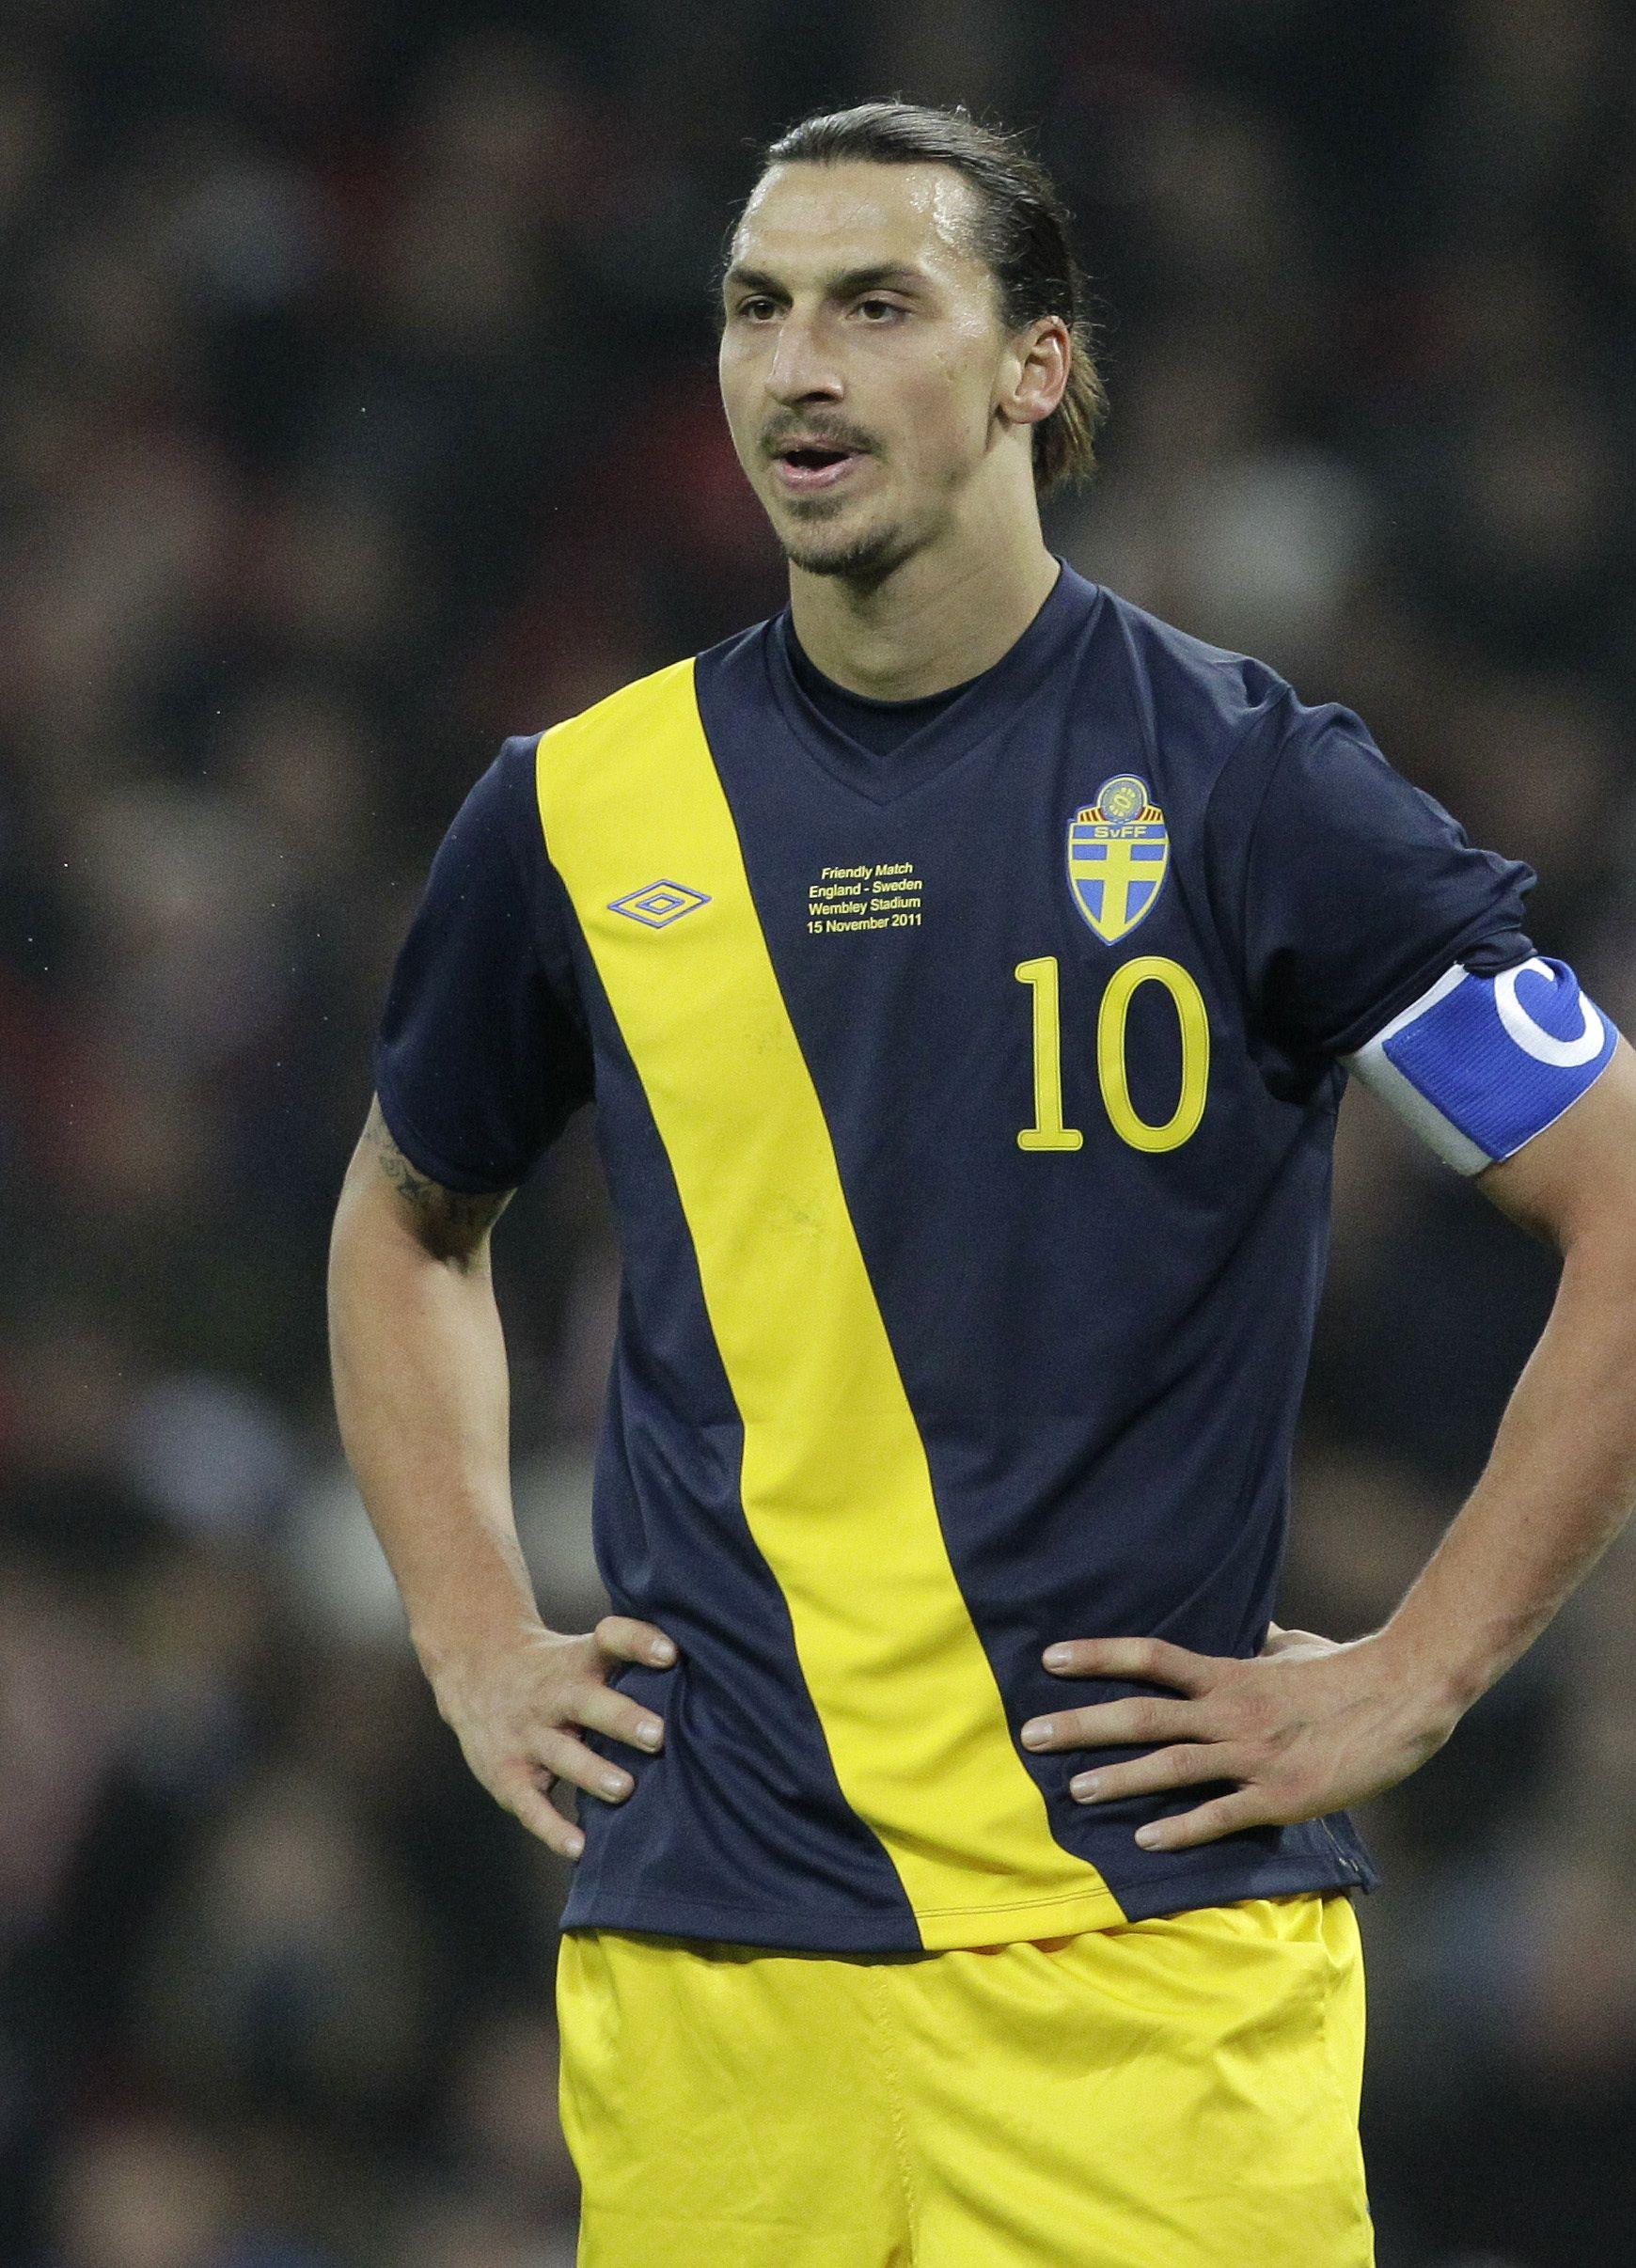 Zlatan Ibrahimovic bicycle kick - Zlatan Ibrahimovic ... Zlatan Ibrahimovic Bicycle Kick